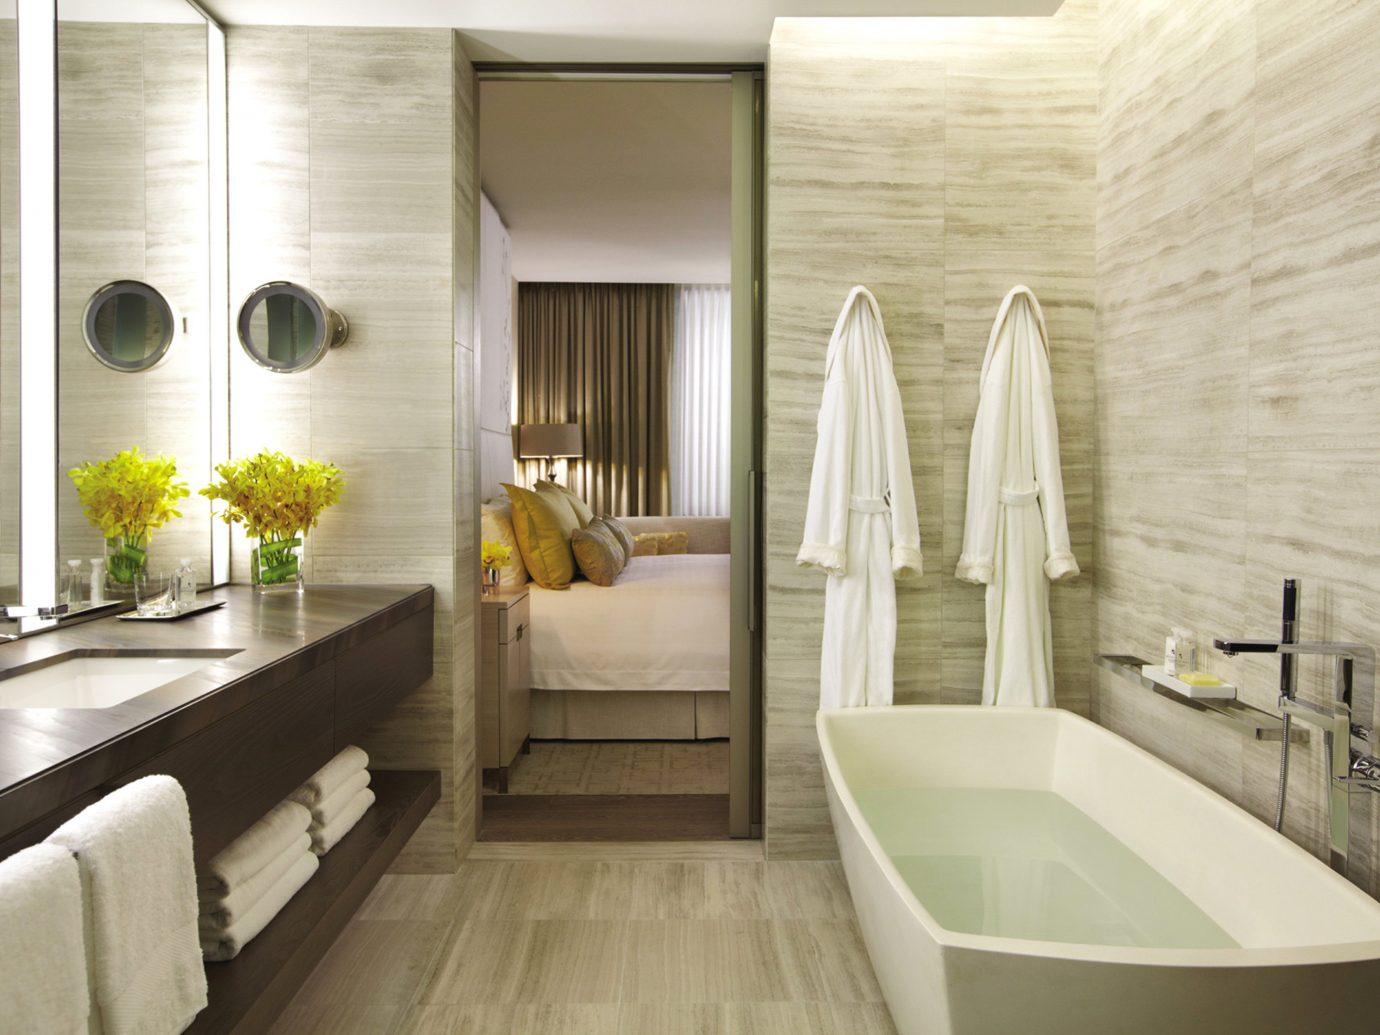 Bath Bedroom Canada Classic Hotels Living Luxury Resort Toronto indoor floor bathroom room property interior design home estate white bathtub Design Suite swimming pool wood tub